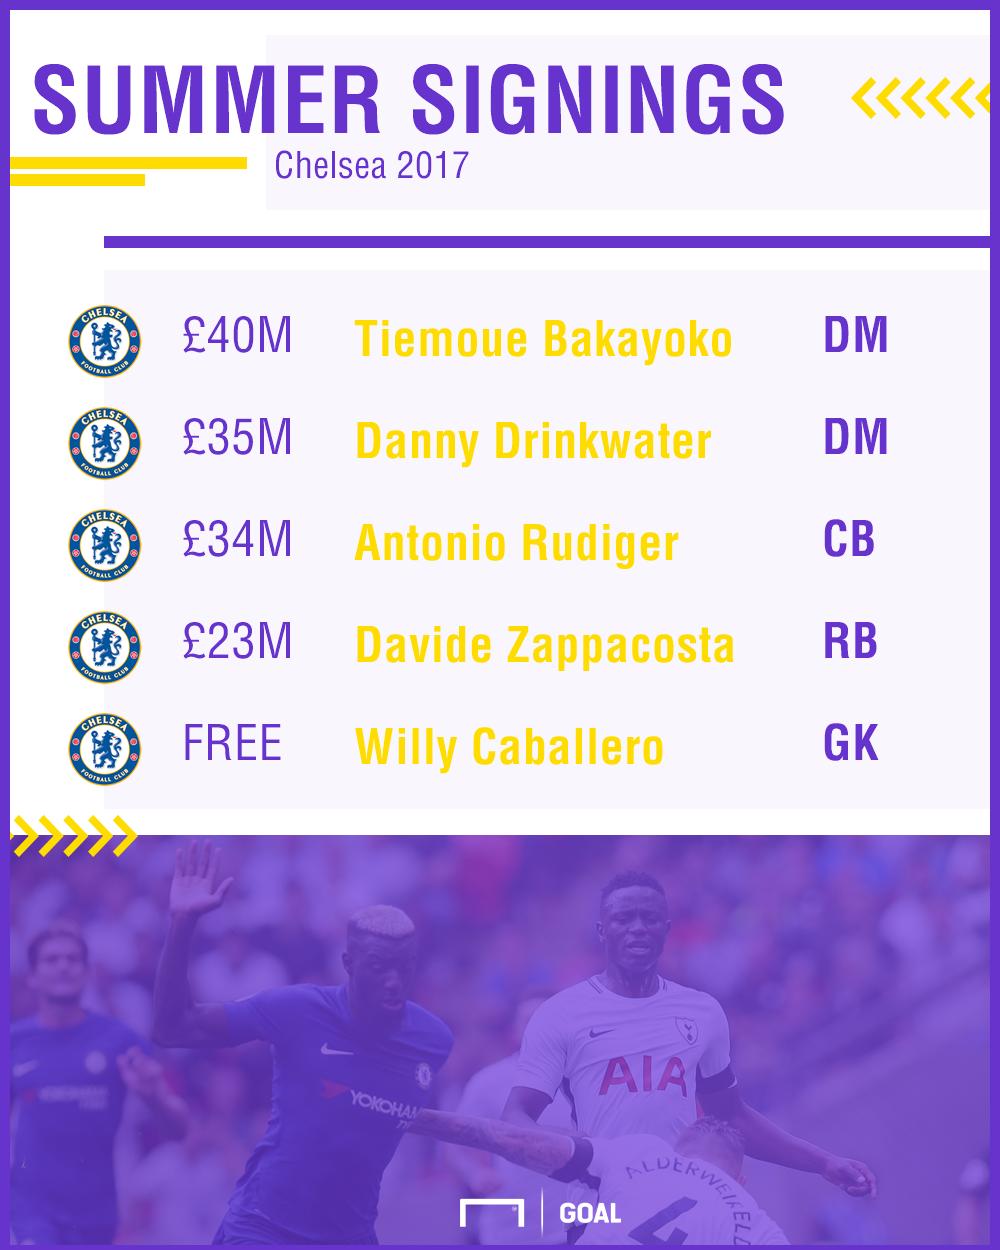 Chelsea defensive summer signings 2017